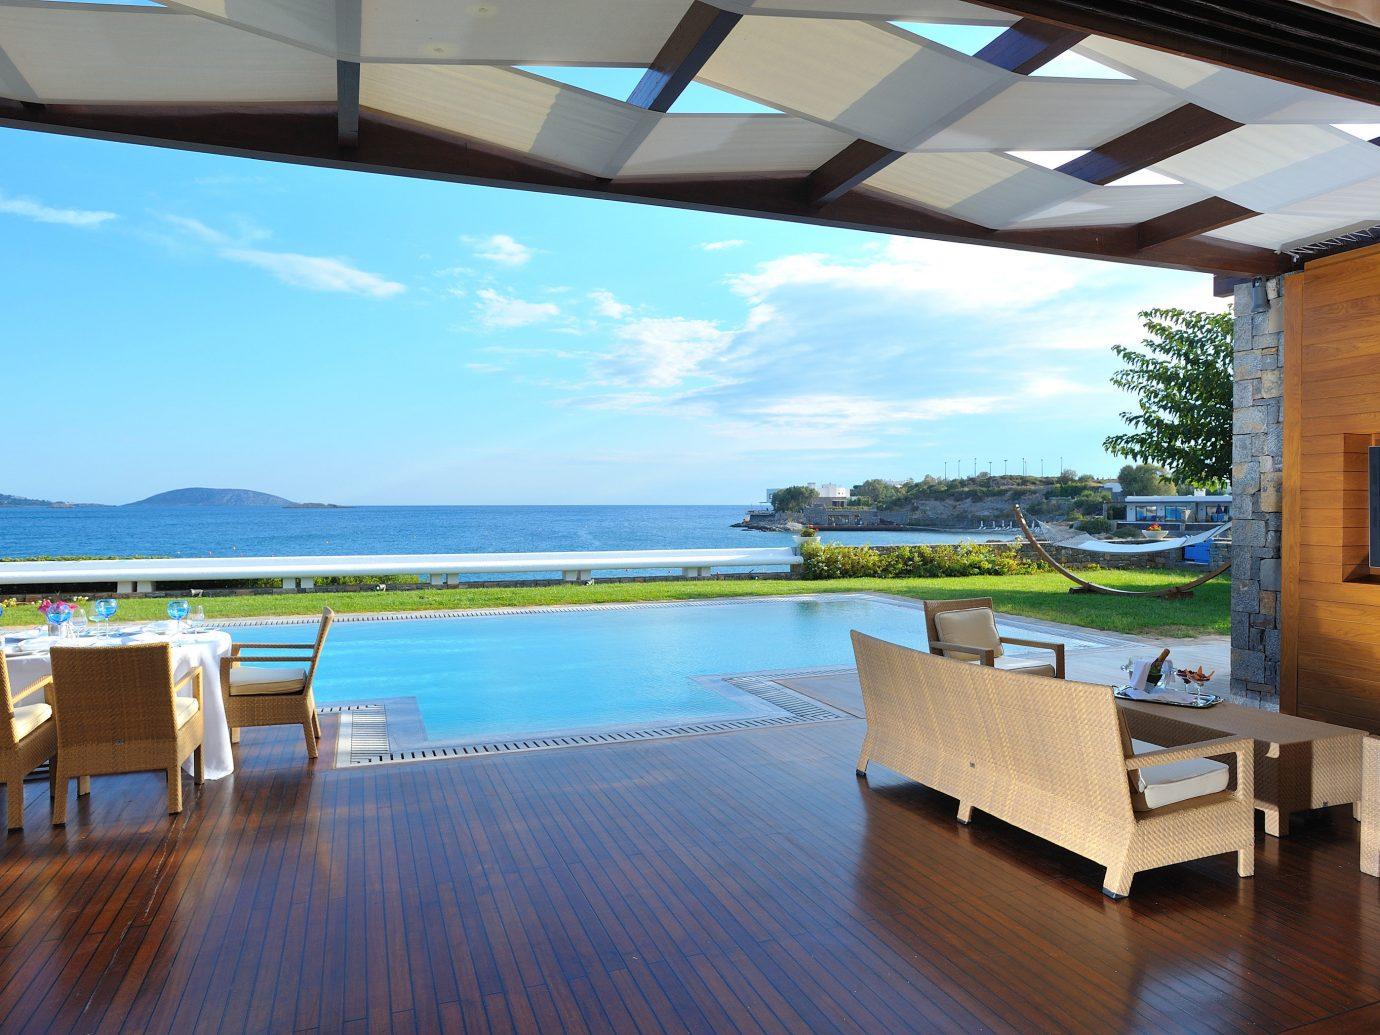 Hotels Luxury Travel floor table chair swimming pool property leisure wooden estate vacation Resort condominium Villa real estate home interior design apartment Deck furniture wood